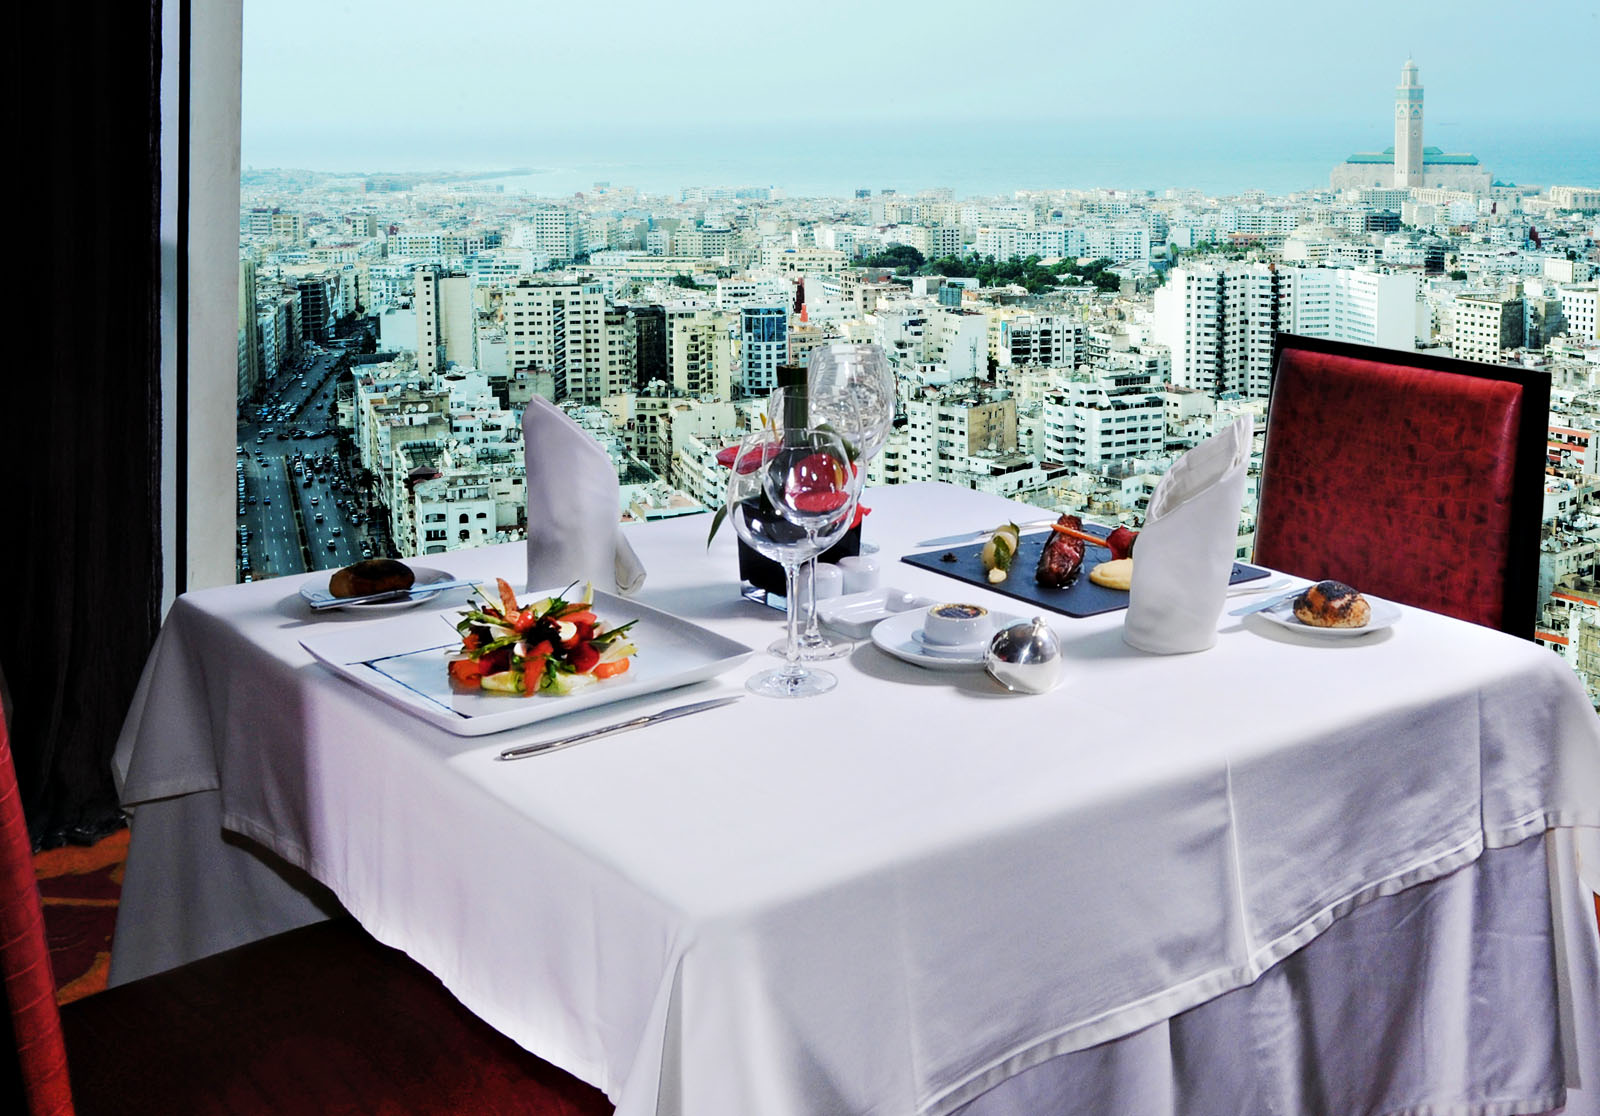 Restaurant at Kenzi Tower Hotel in central Casablanca, Morocco